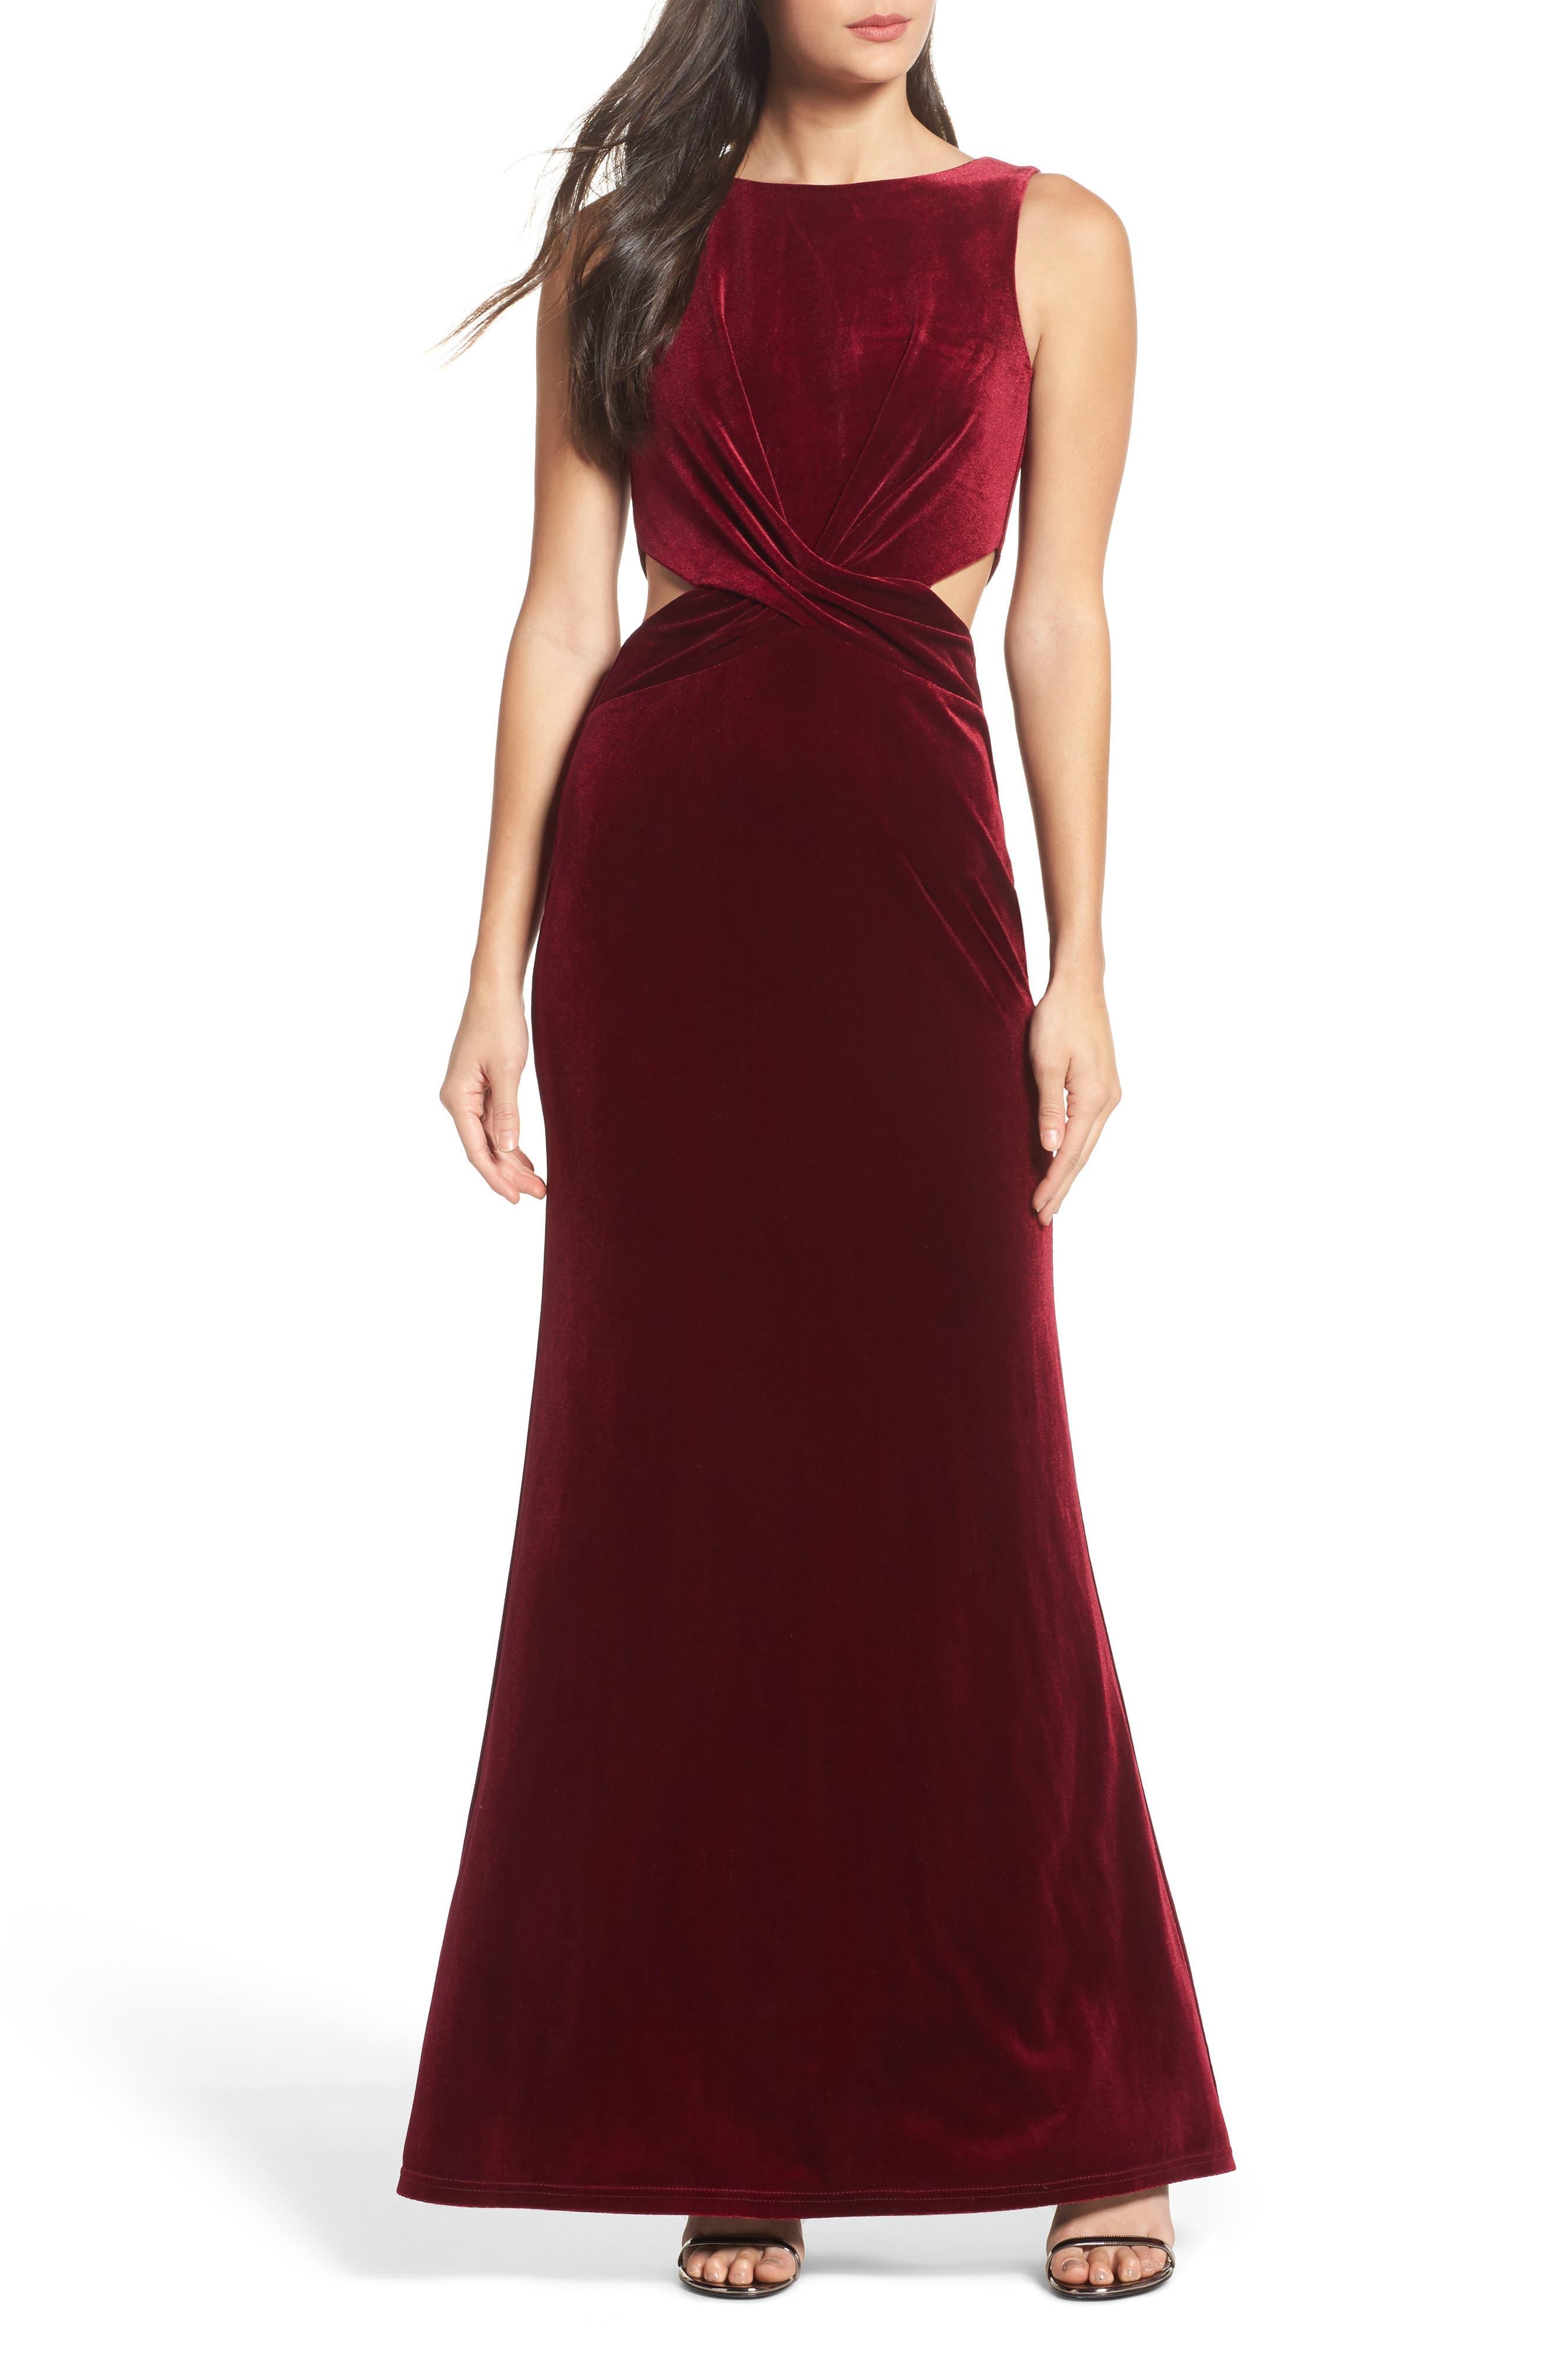 Alternate Image 1 Selected - Lulus Reach Out Velvet Maxi Dress